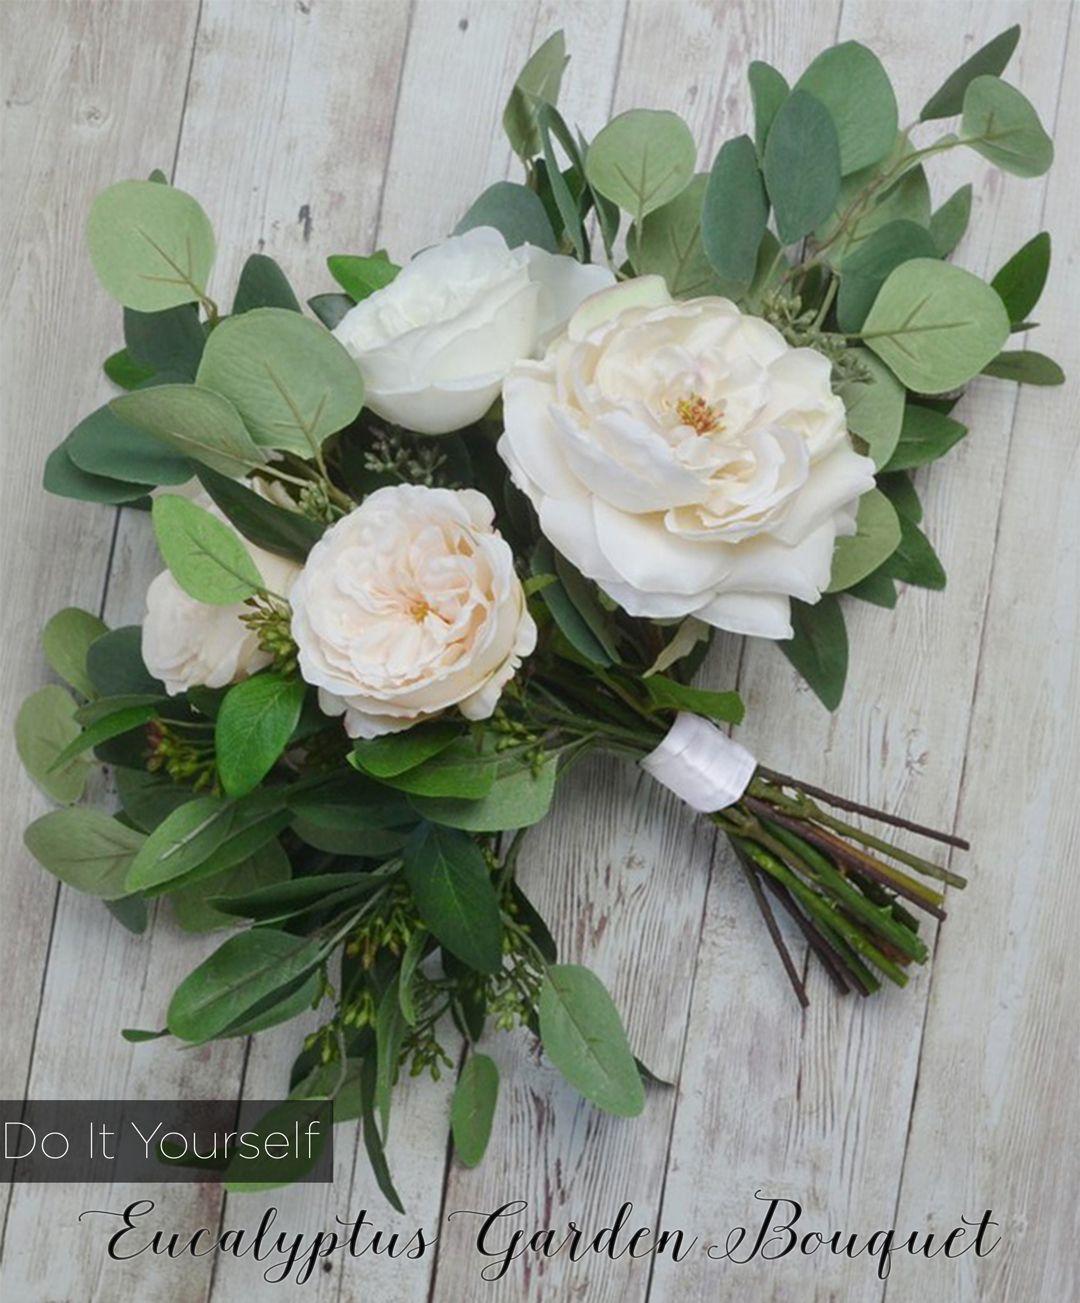 Diy Eucalyptus Bouquet Diy Bridal Bouquet Artificial Bouquets Wedding Flower Bouquet Wedding